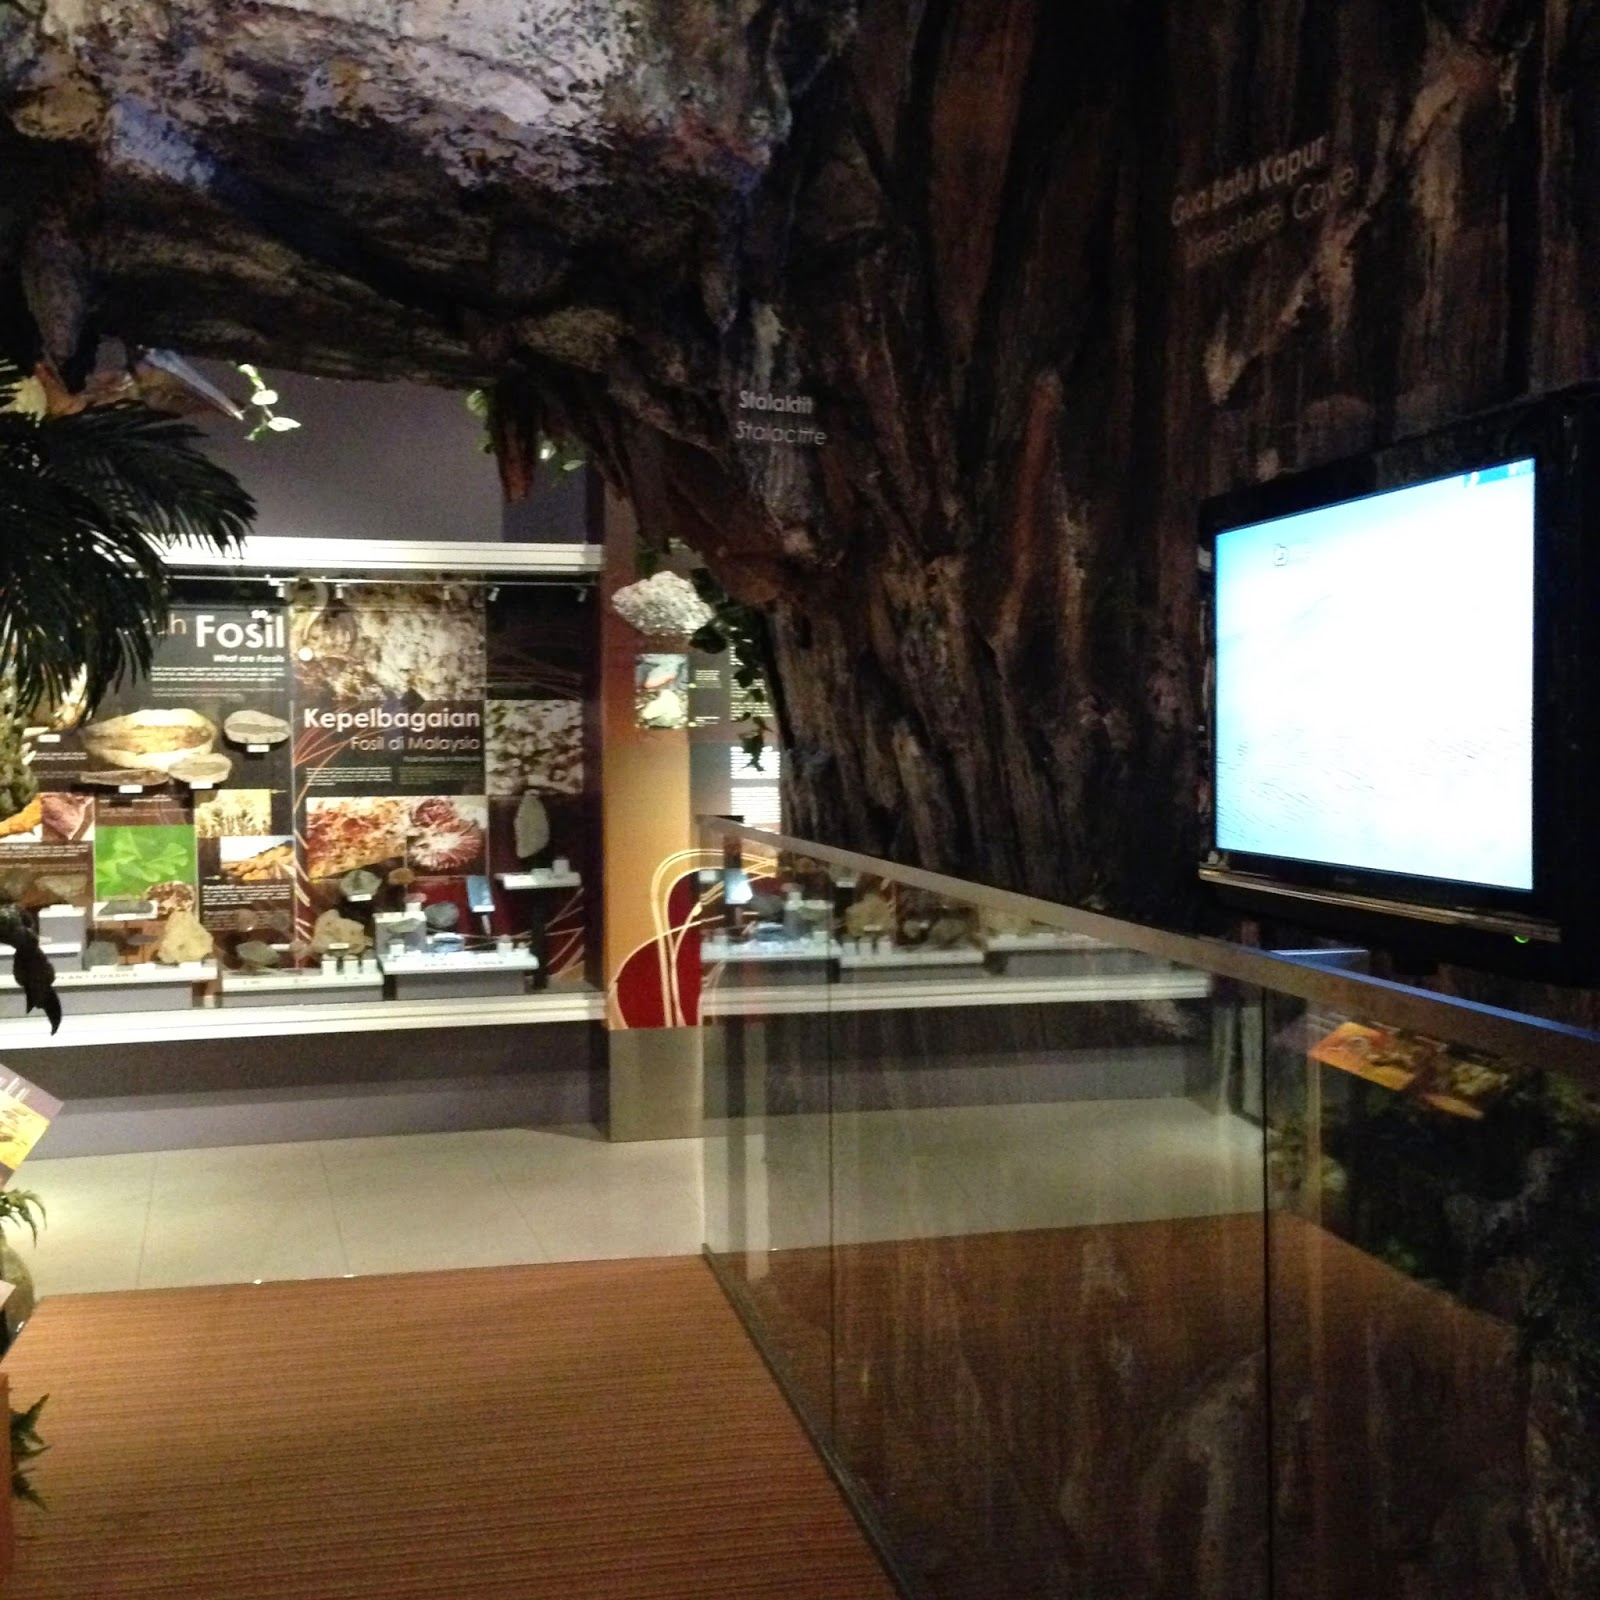 Museum of Geology Ipoh Perak Malaysia